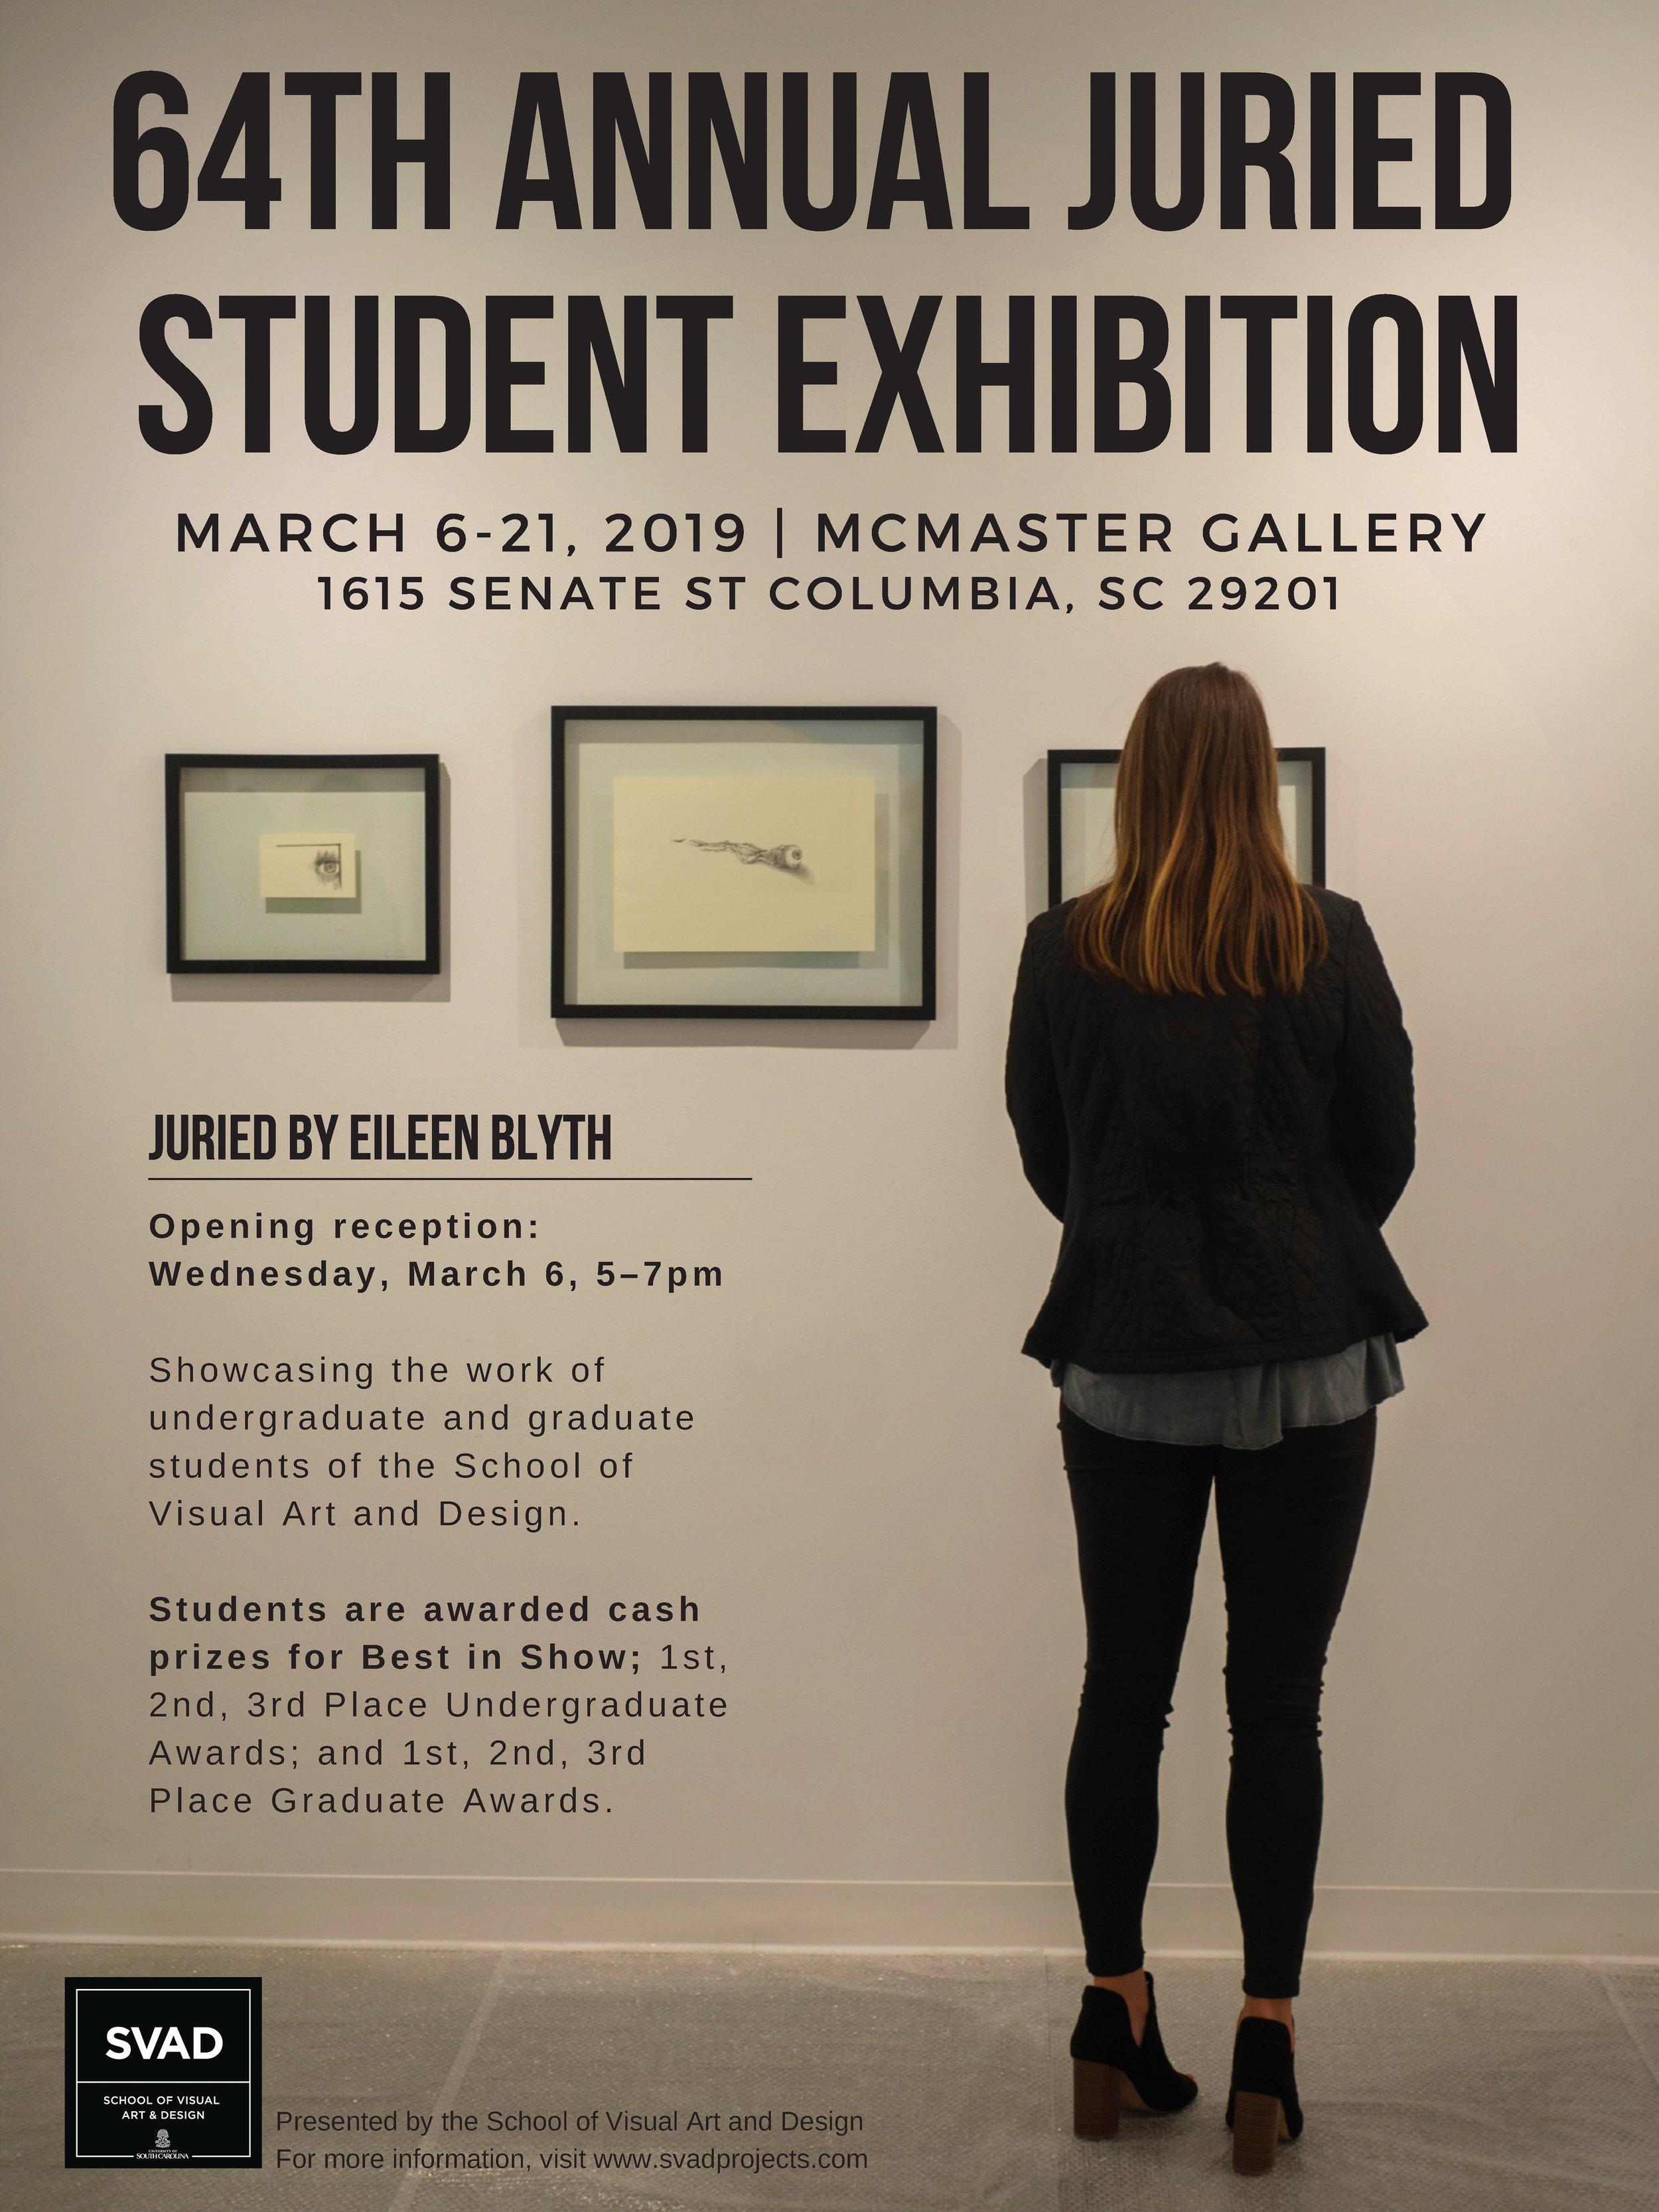 Student Exhibition 2019 Poster.jpg